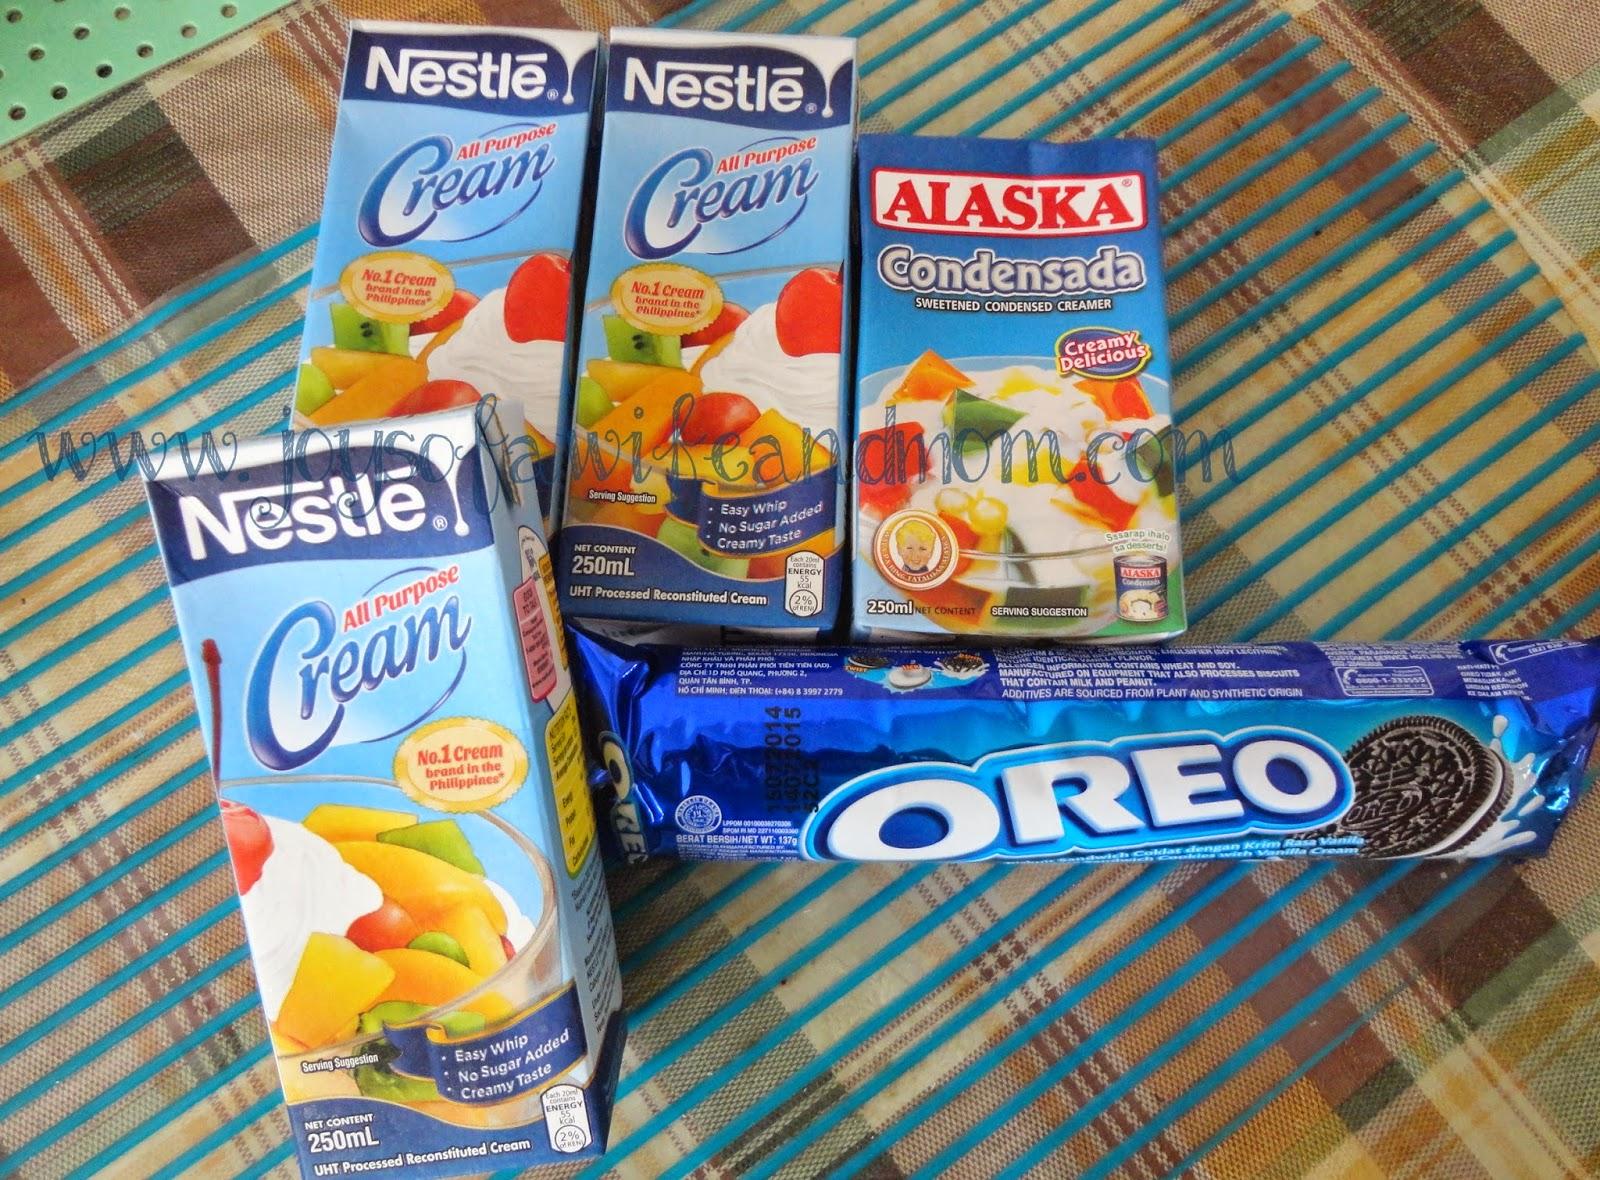 Home-made Ice Cream with Oreo Cookies